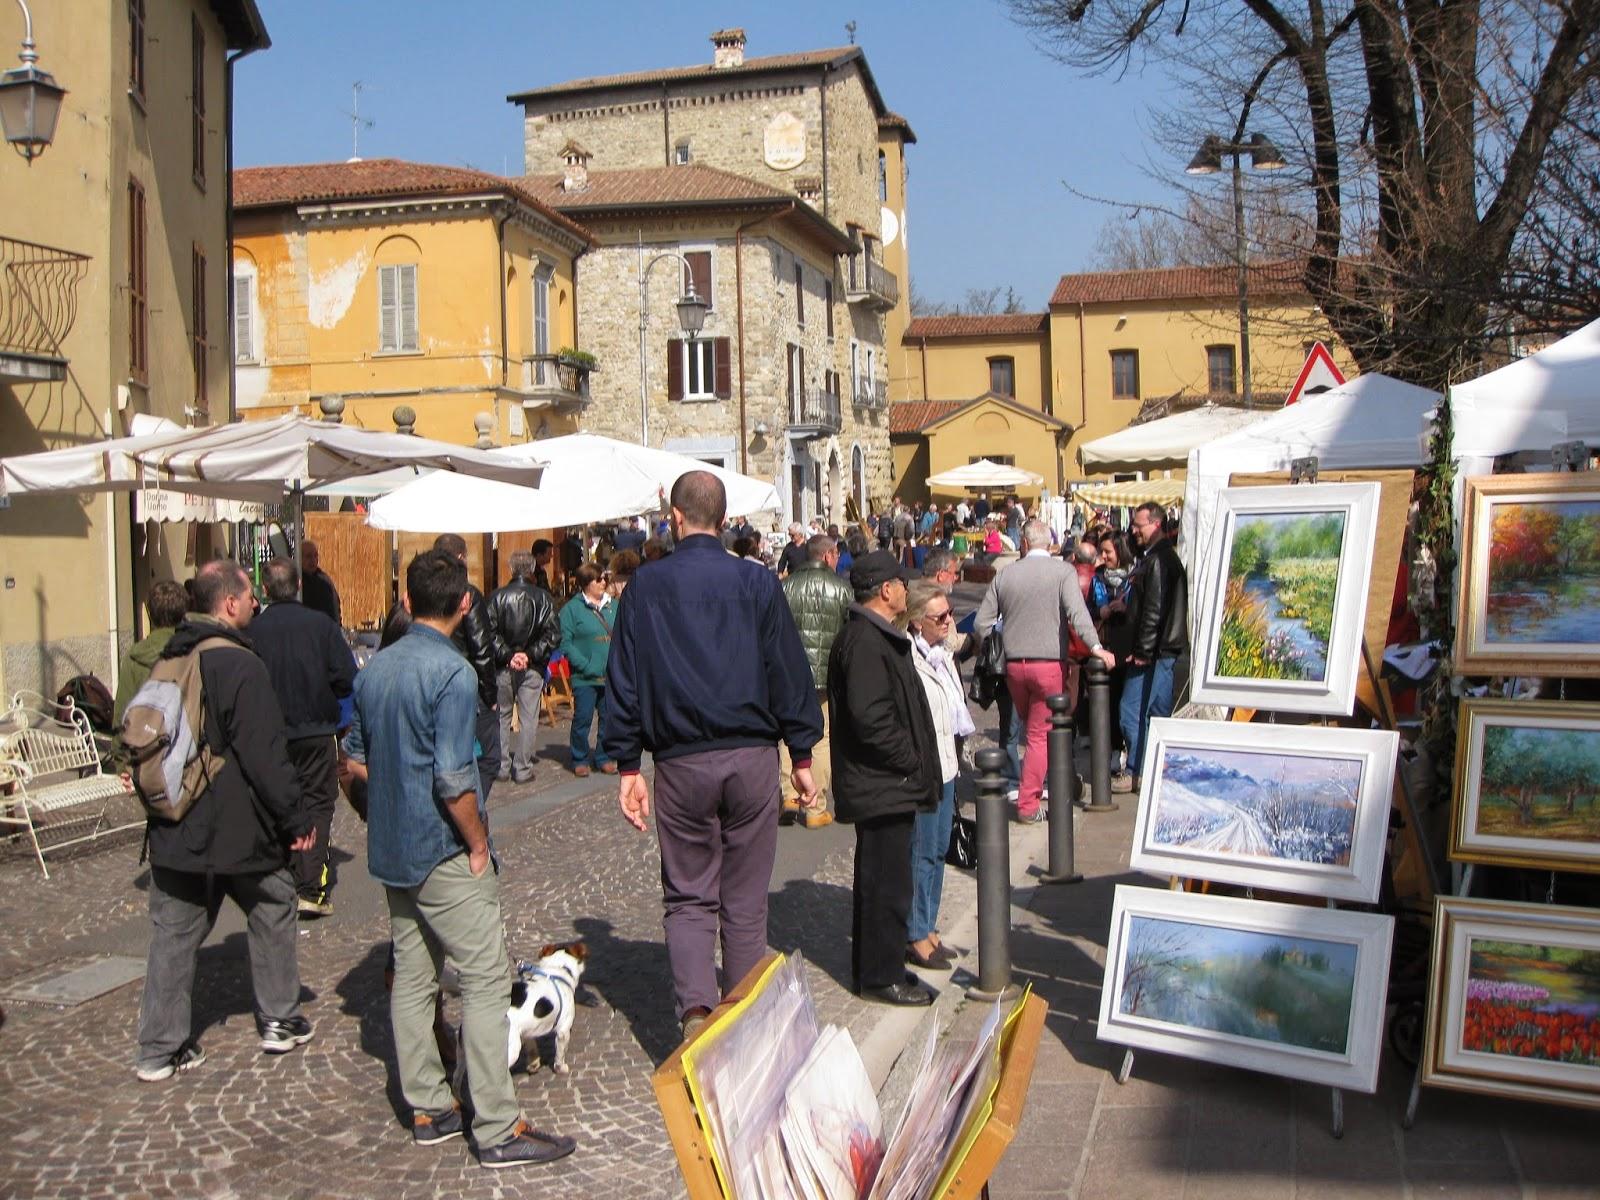 Artecarlacolombo mercatino dell 39 antico imbersago - Mercatino imbersago ...